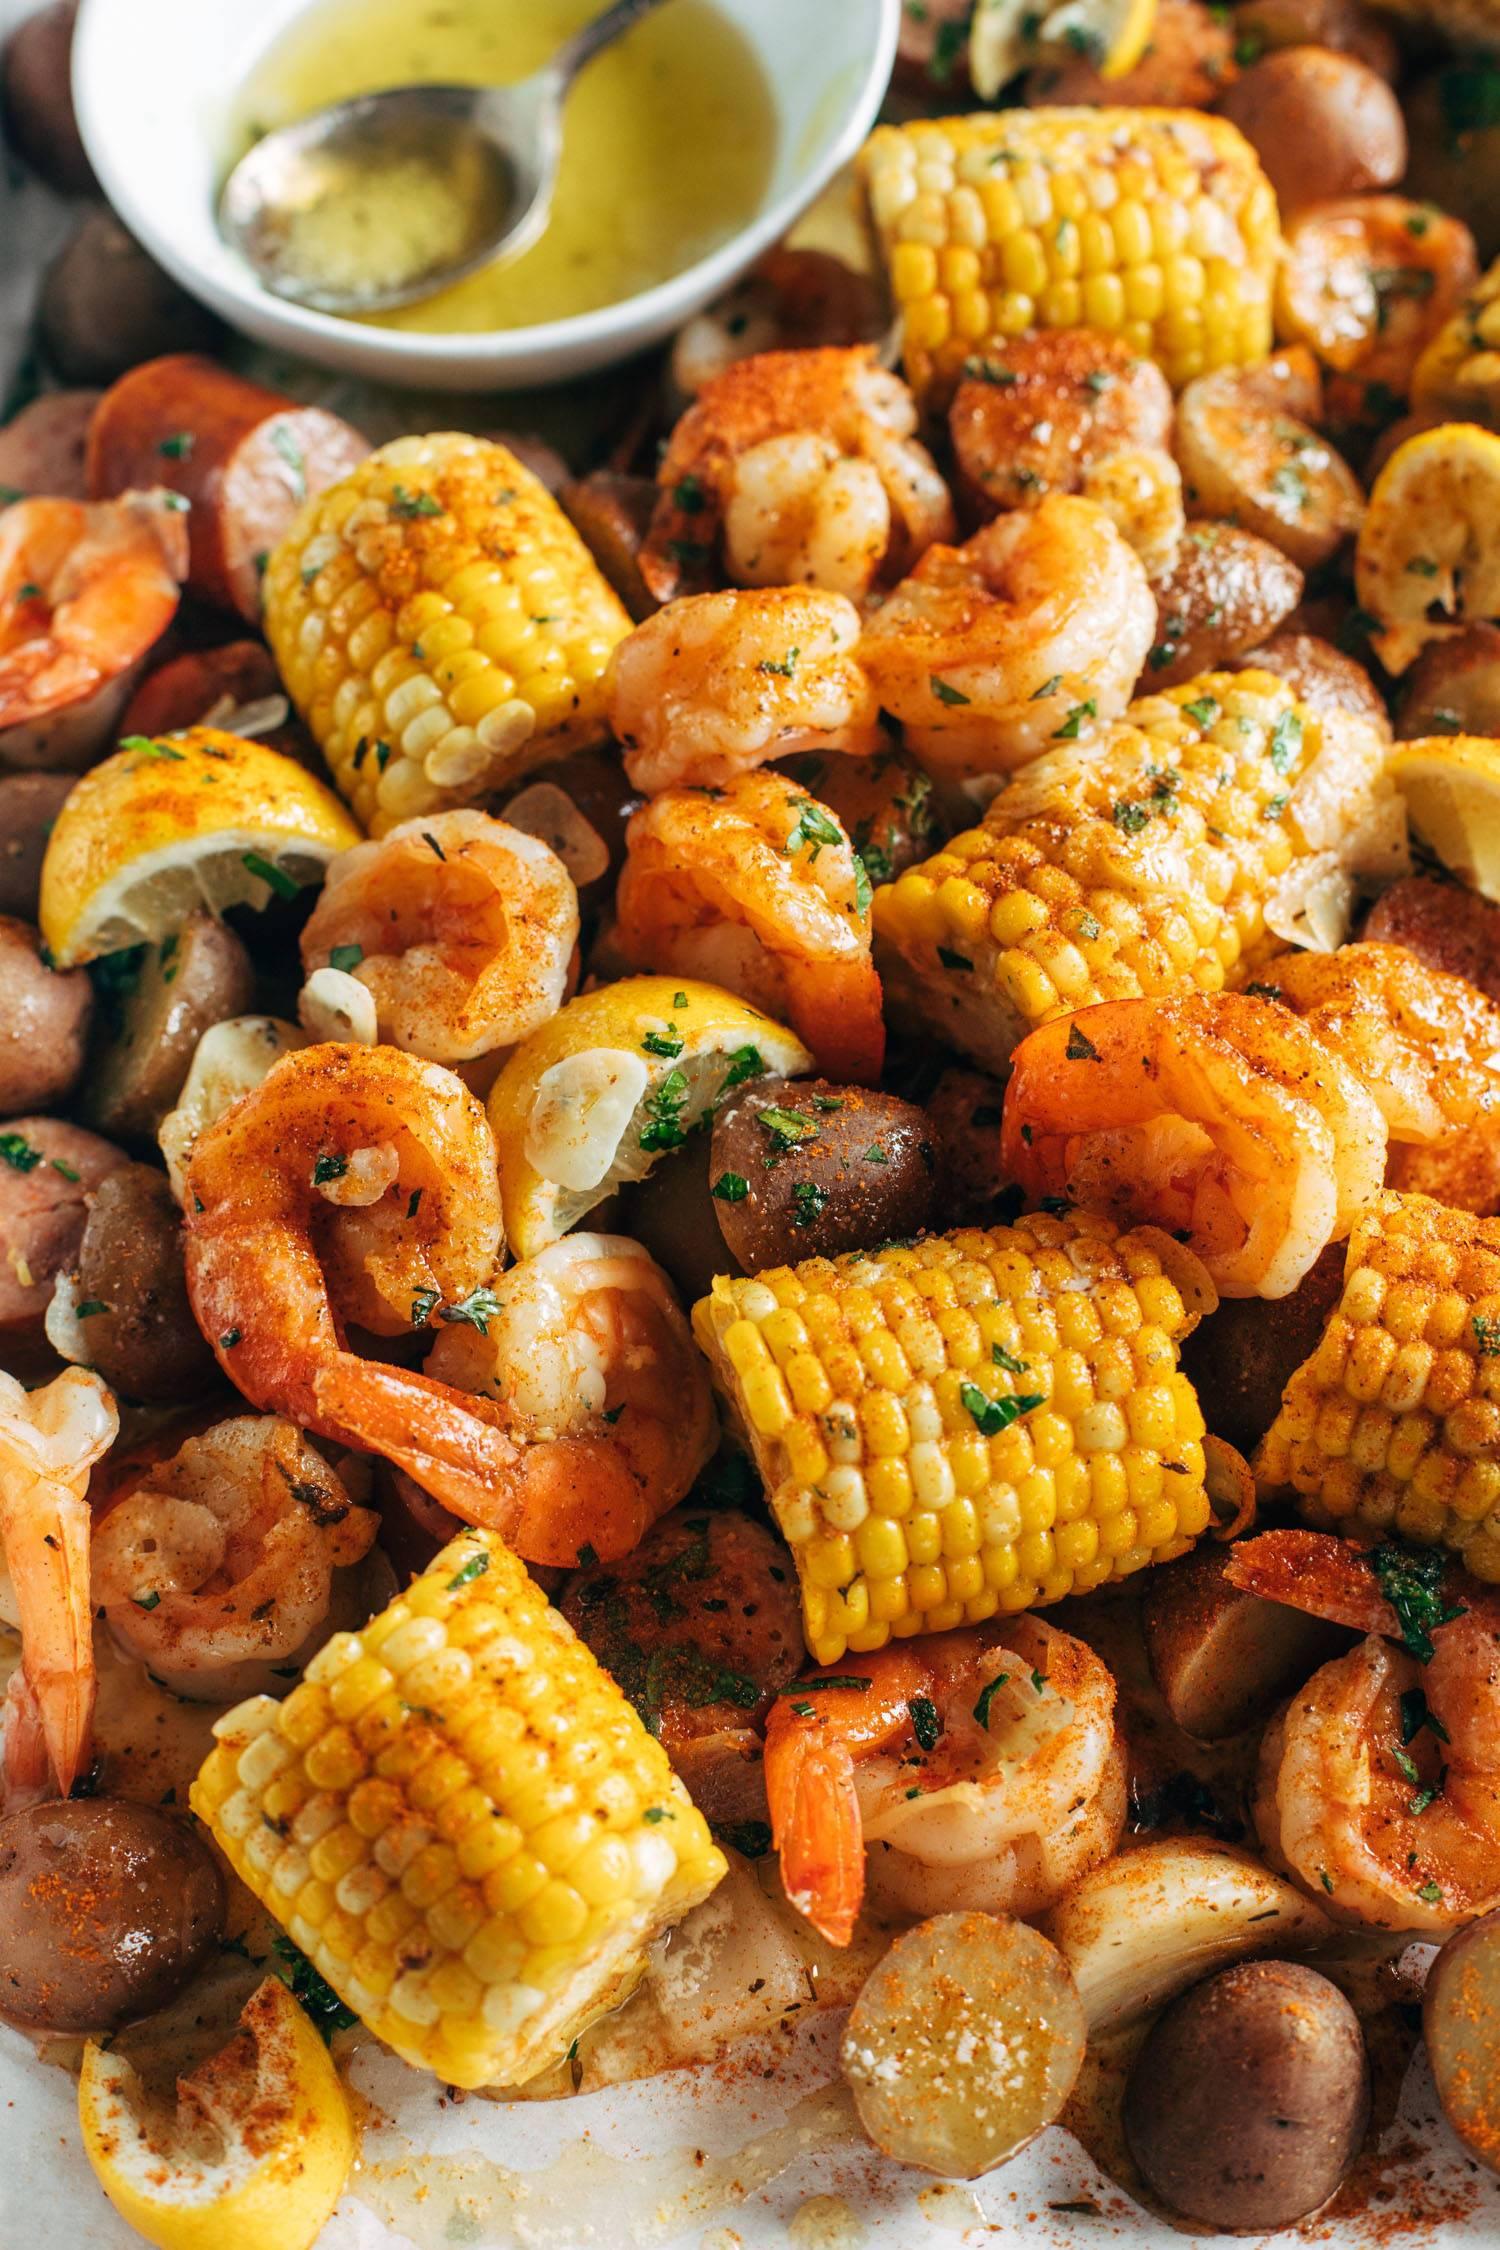 Corn, shrimp, onions, and kielbasa sausage on a platter for a shrimp boil.